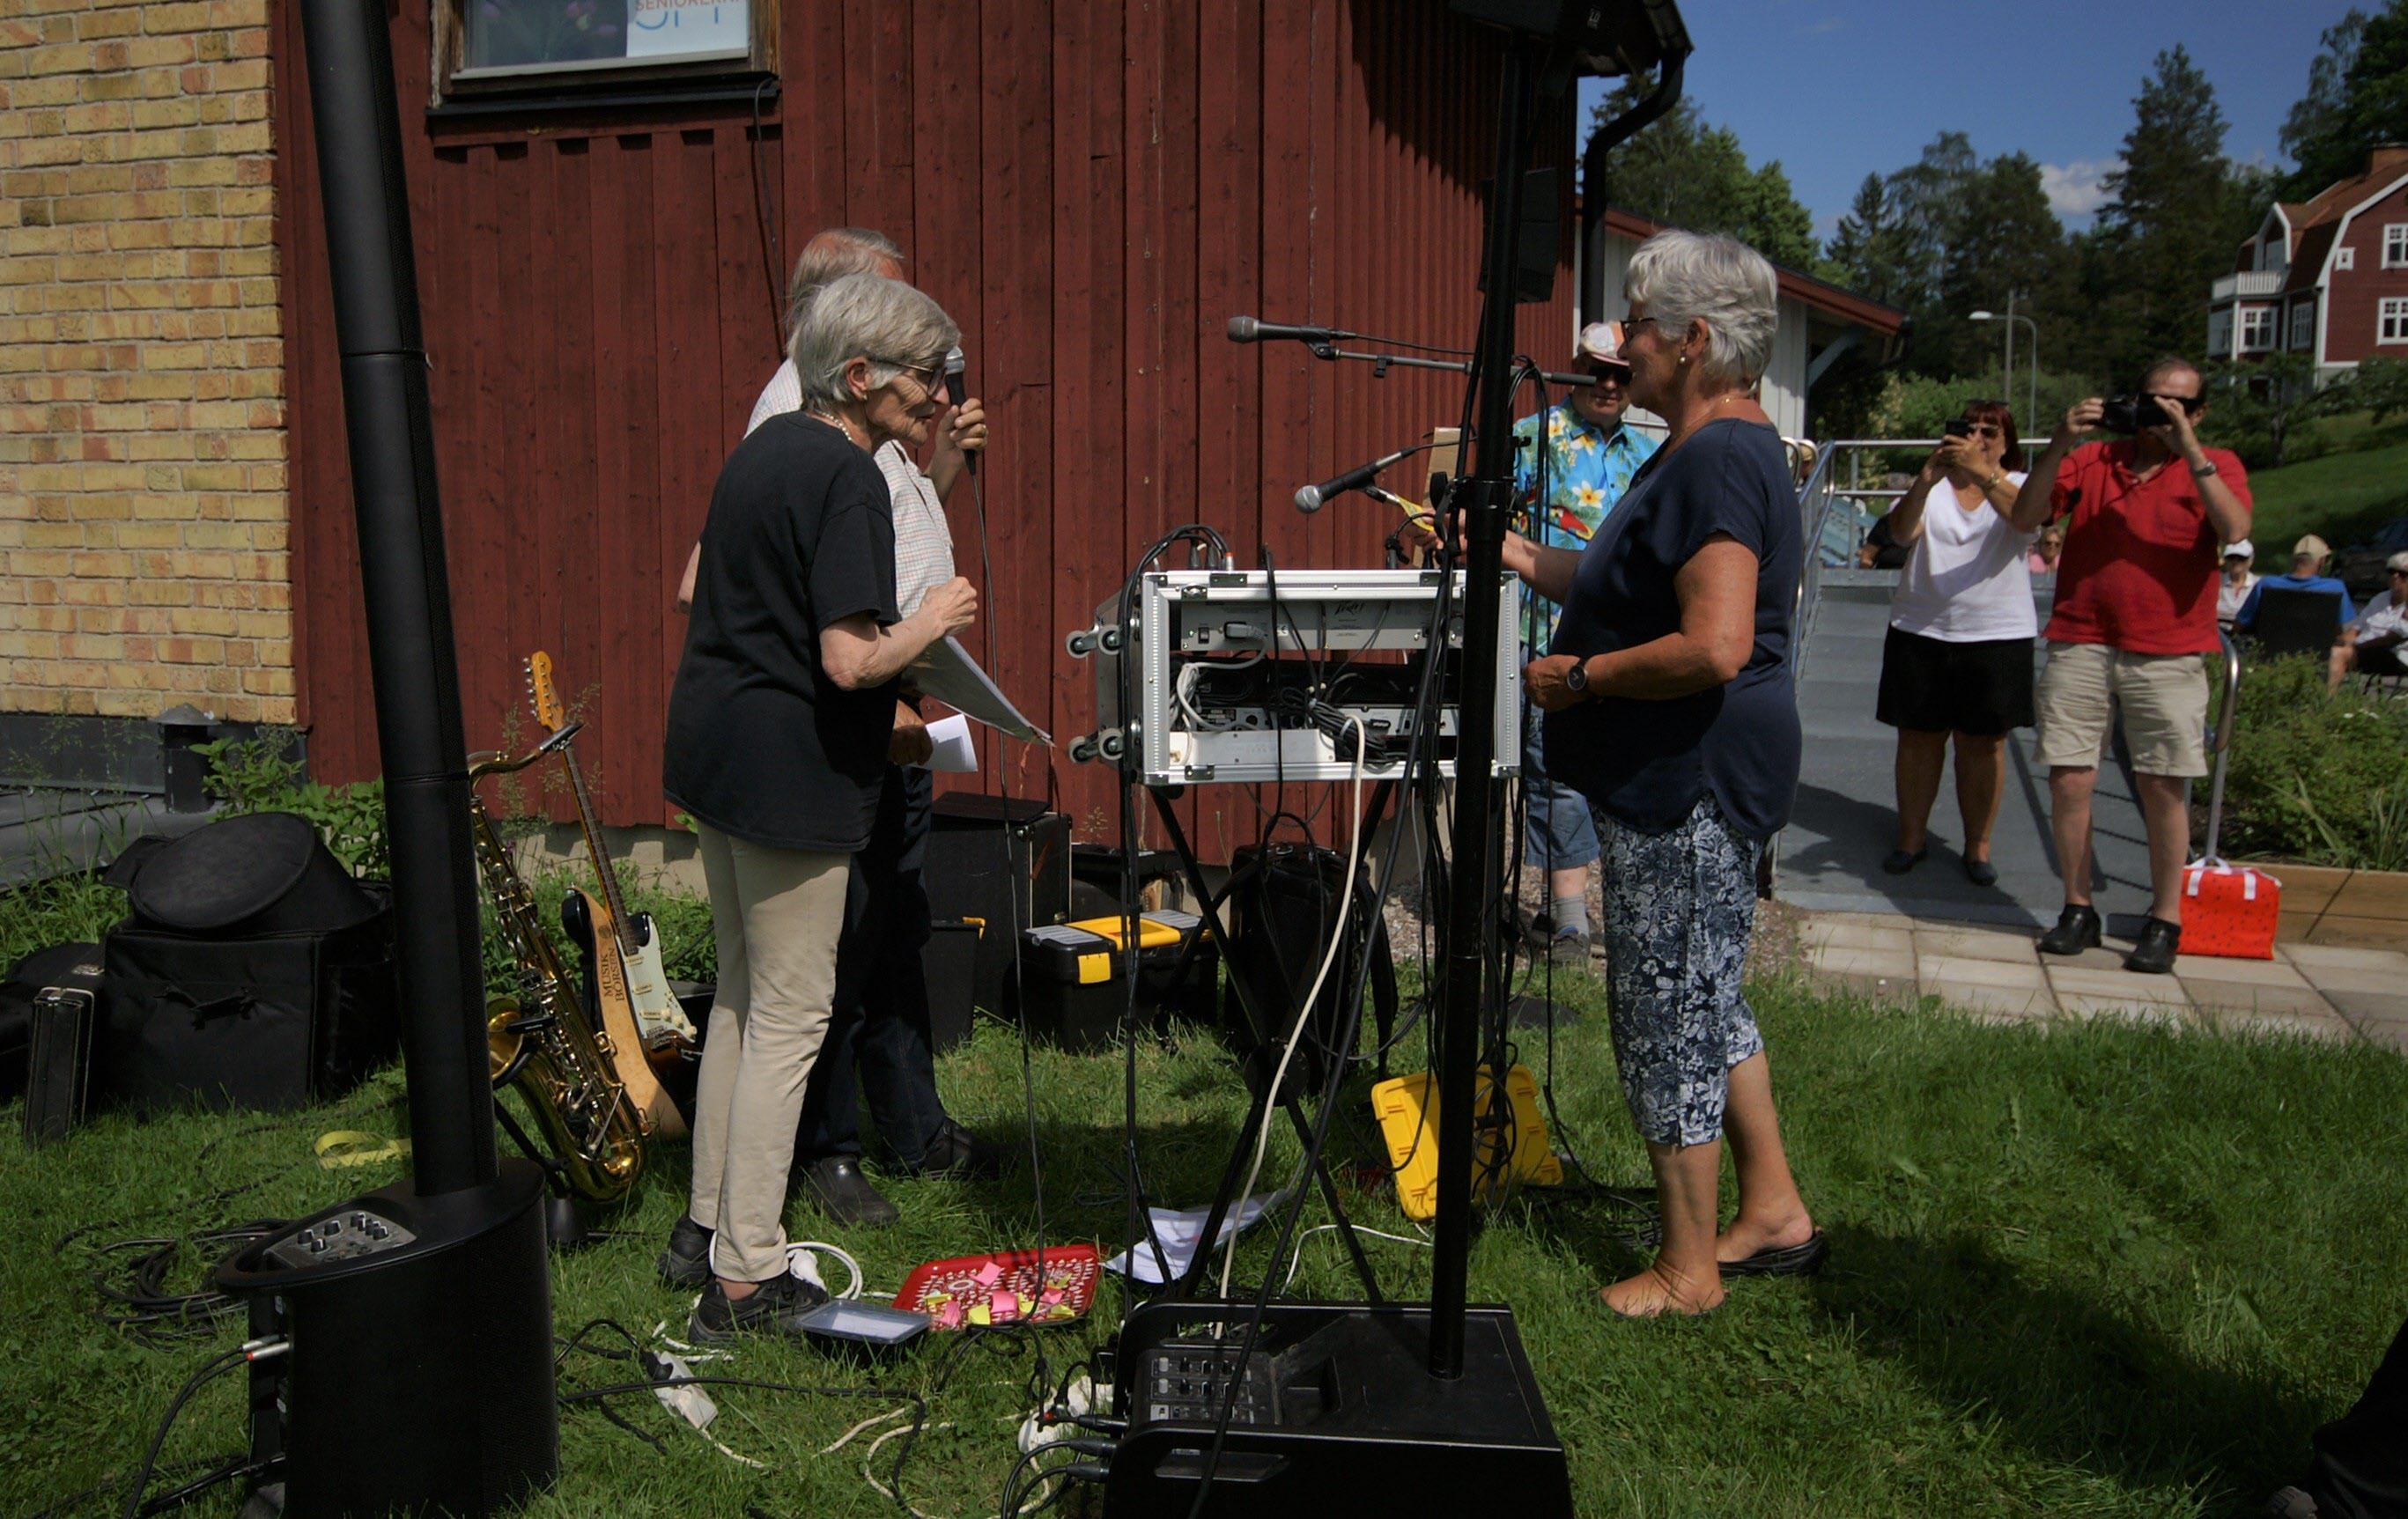 Andrapristagaren Ulla-Britt Larsson